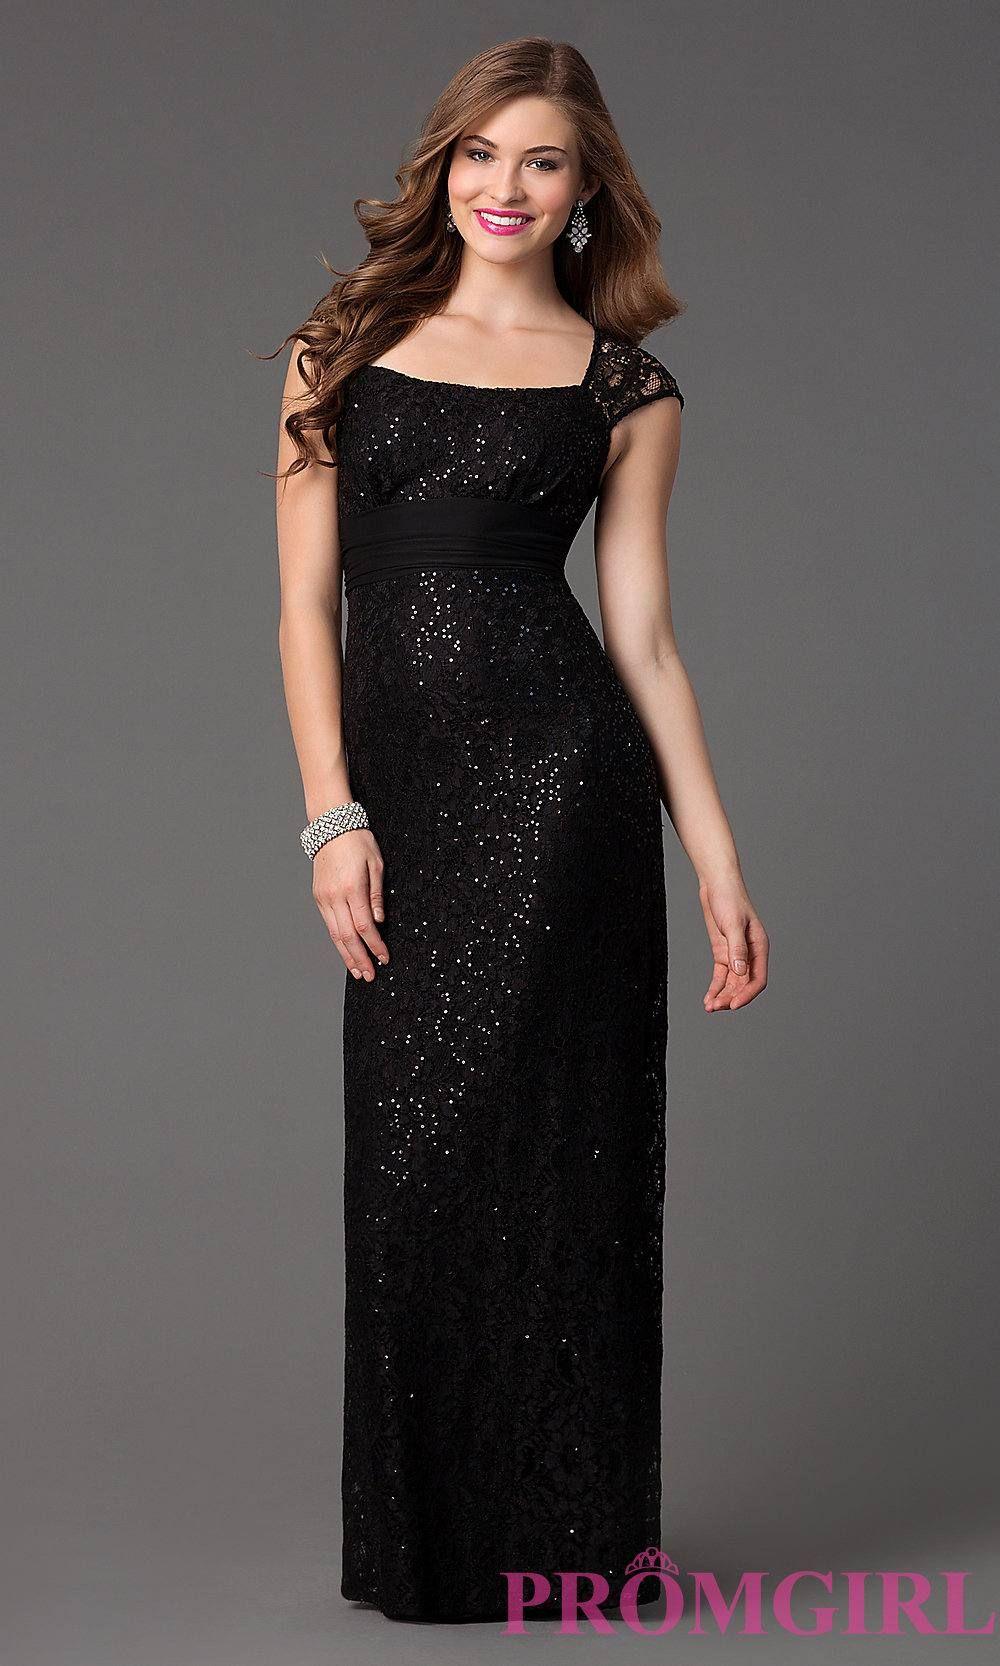 Black sparkly dress black dresses pinterest black sparkly